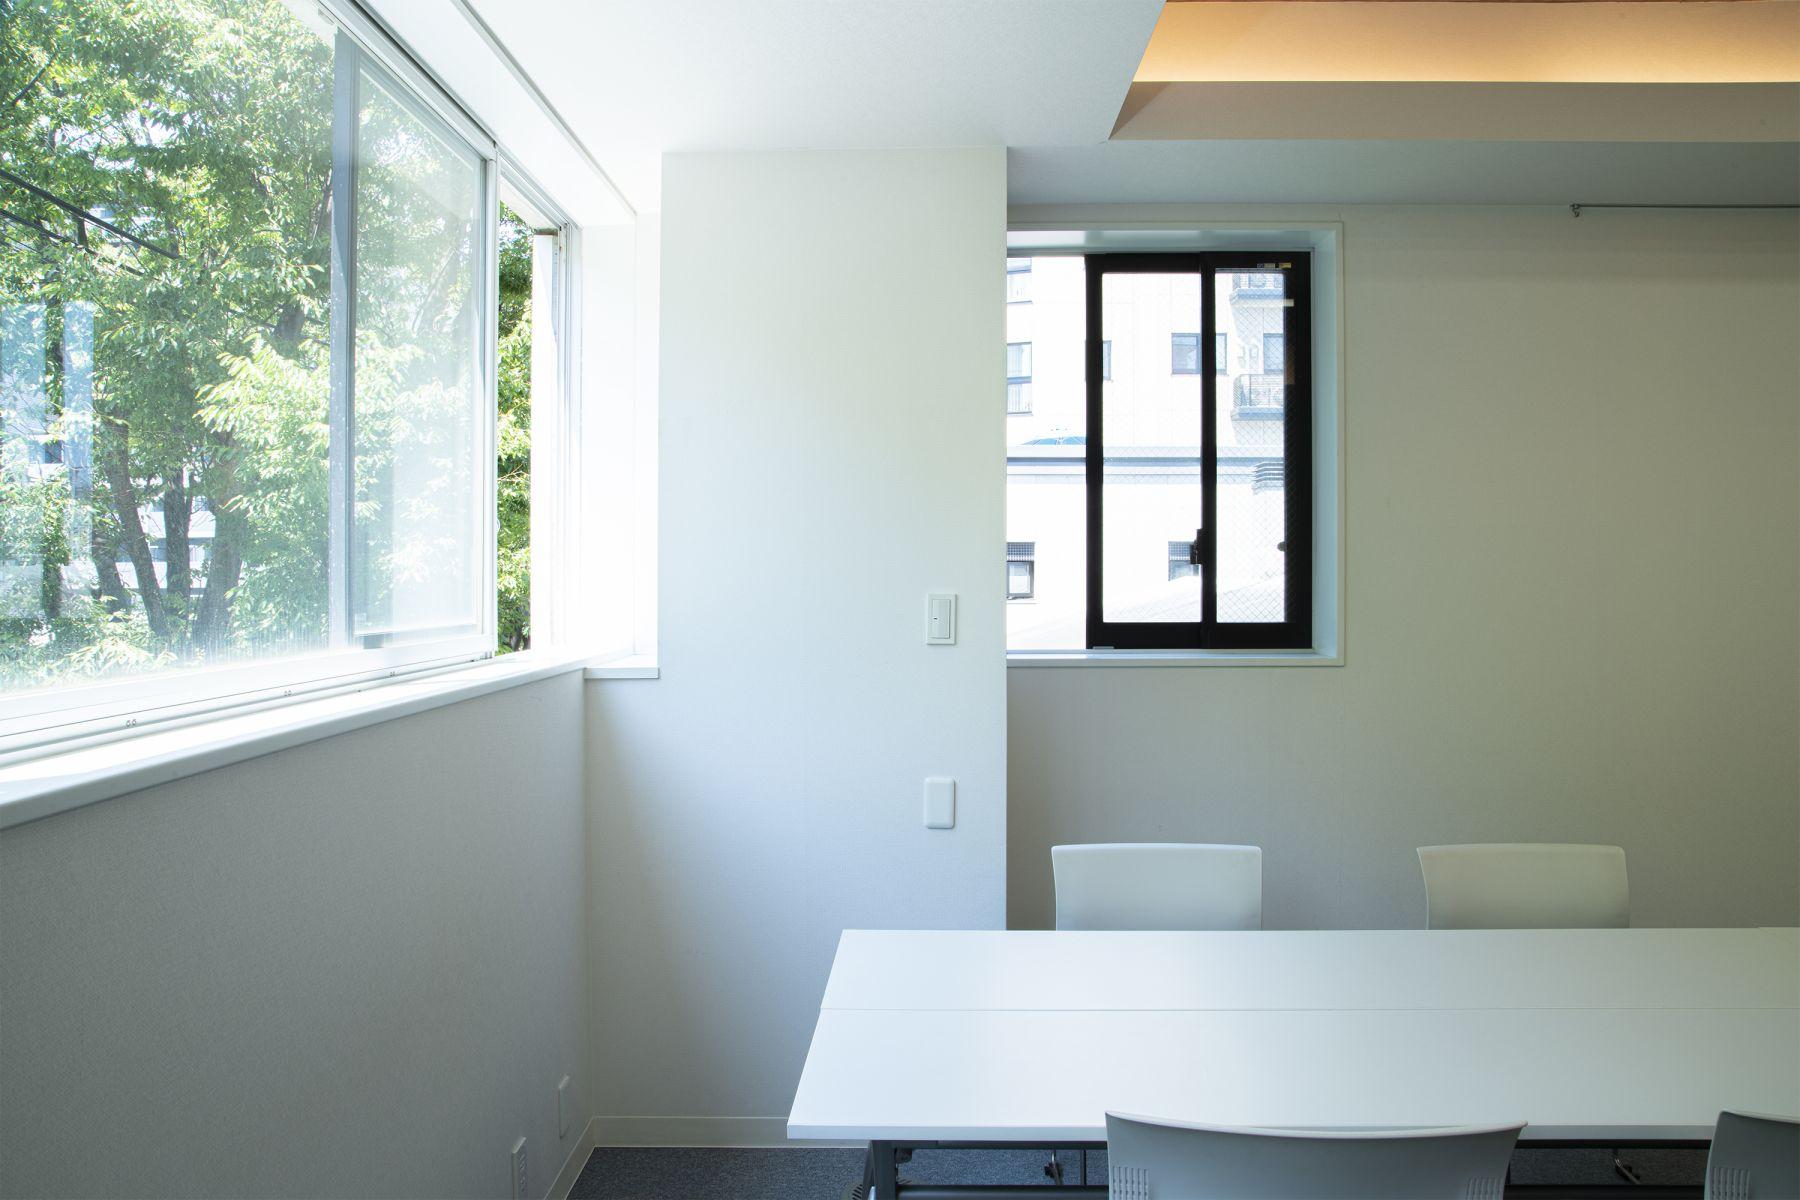 Studio TERRANOVA Dst  キッチン+バルコニー  (スタジオテラノヴァ)ビル前駐車場 最大2台分利用可能